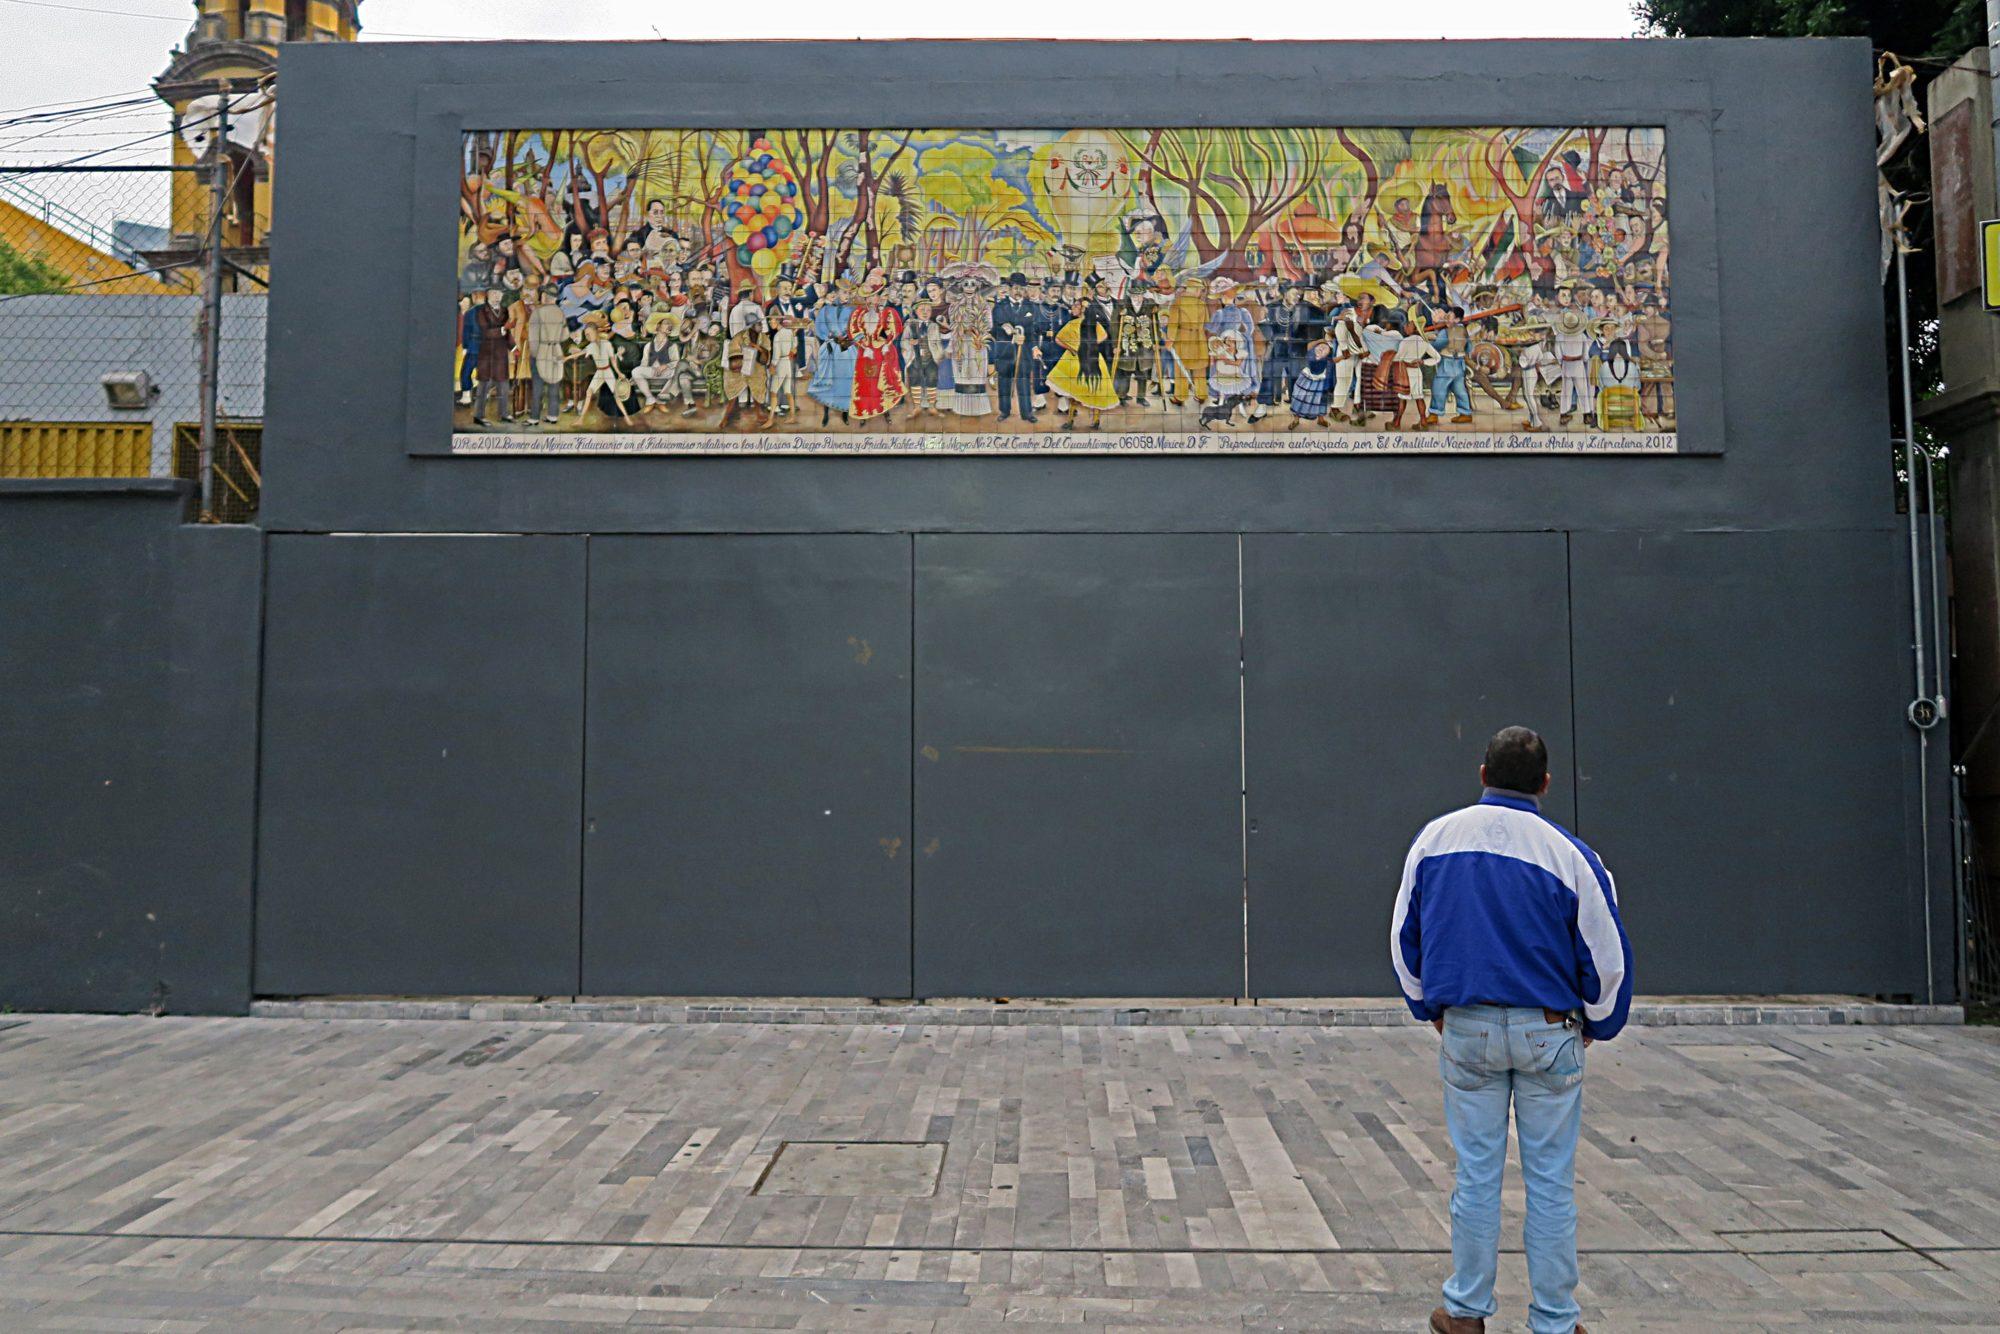 mexiko_stadt_riviera_mural